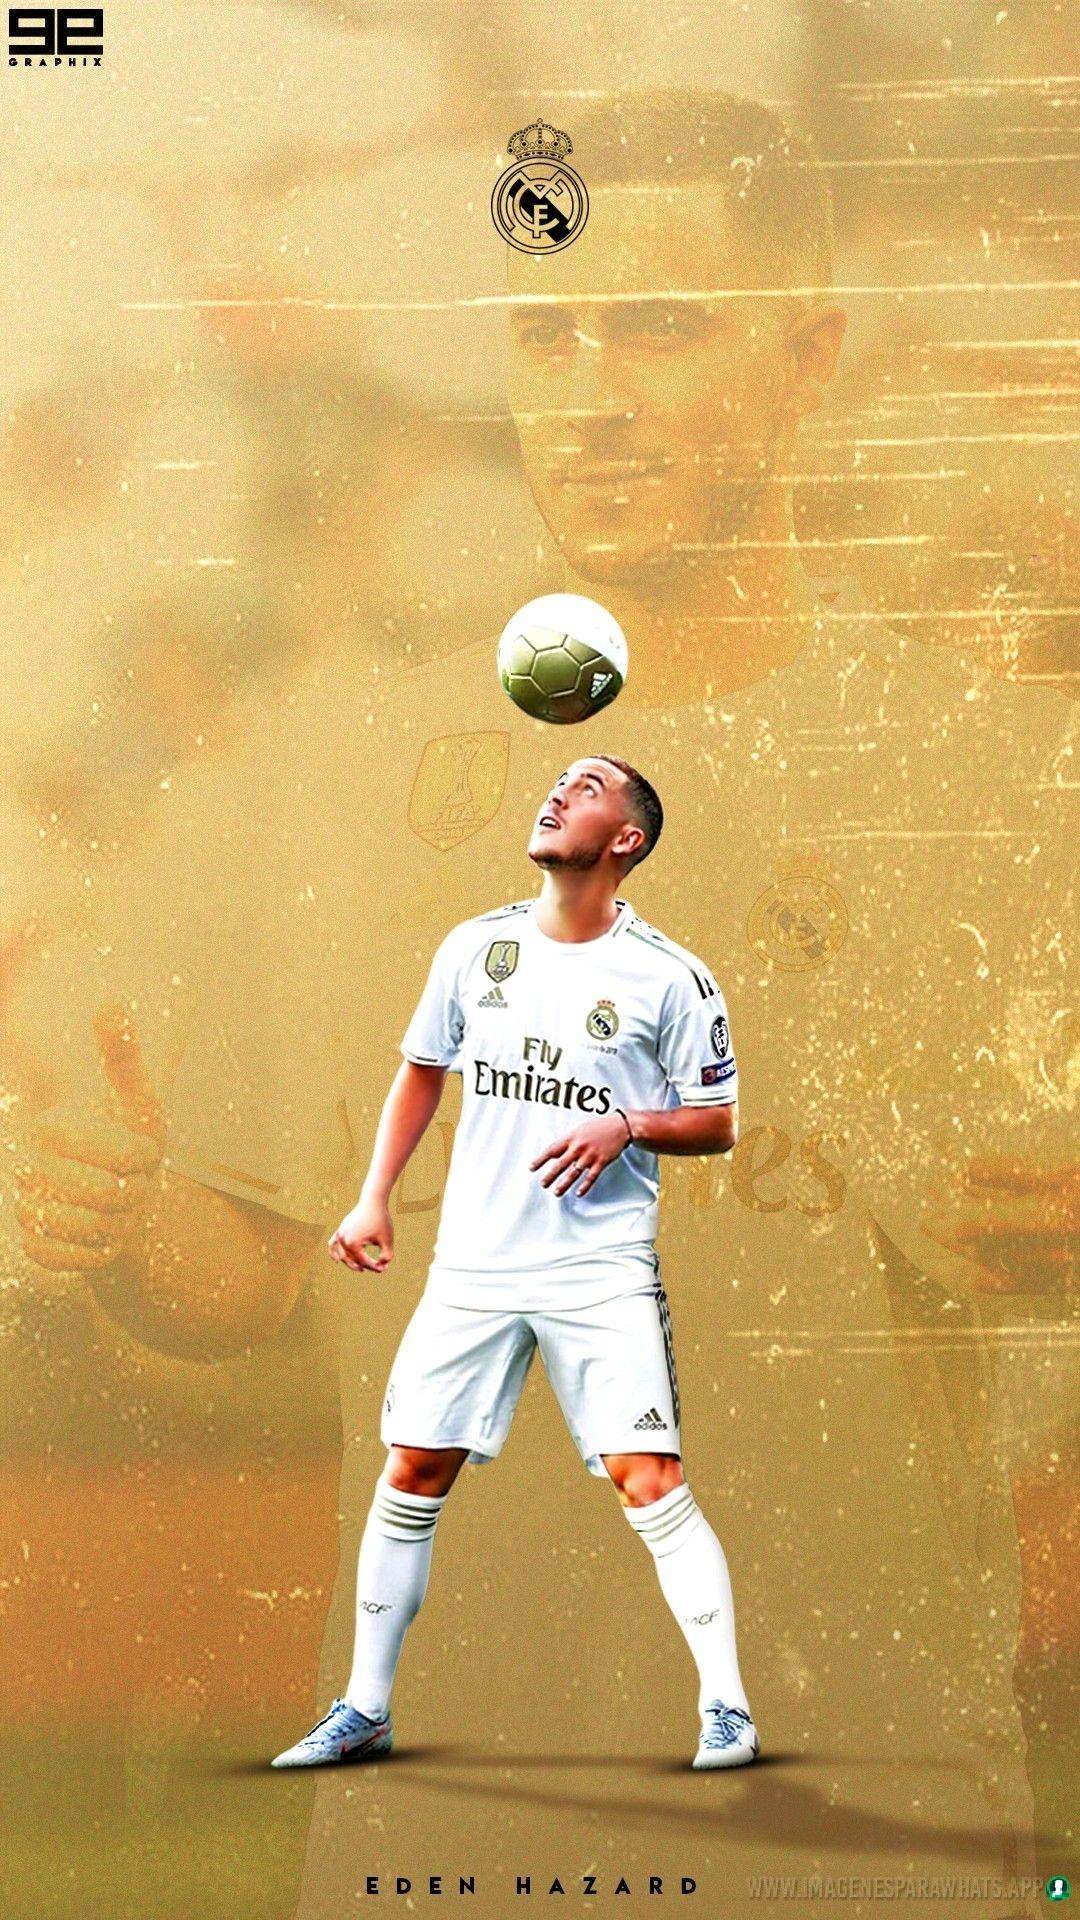 Imagenes de Futbol (1267)